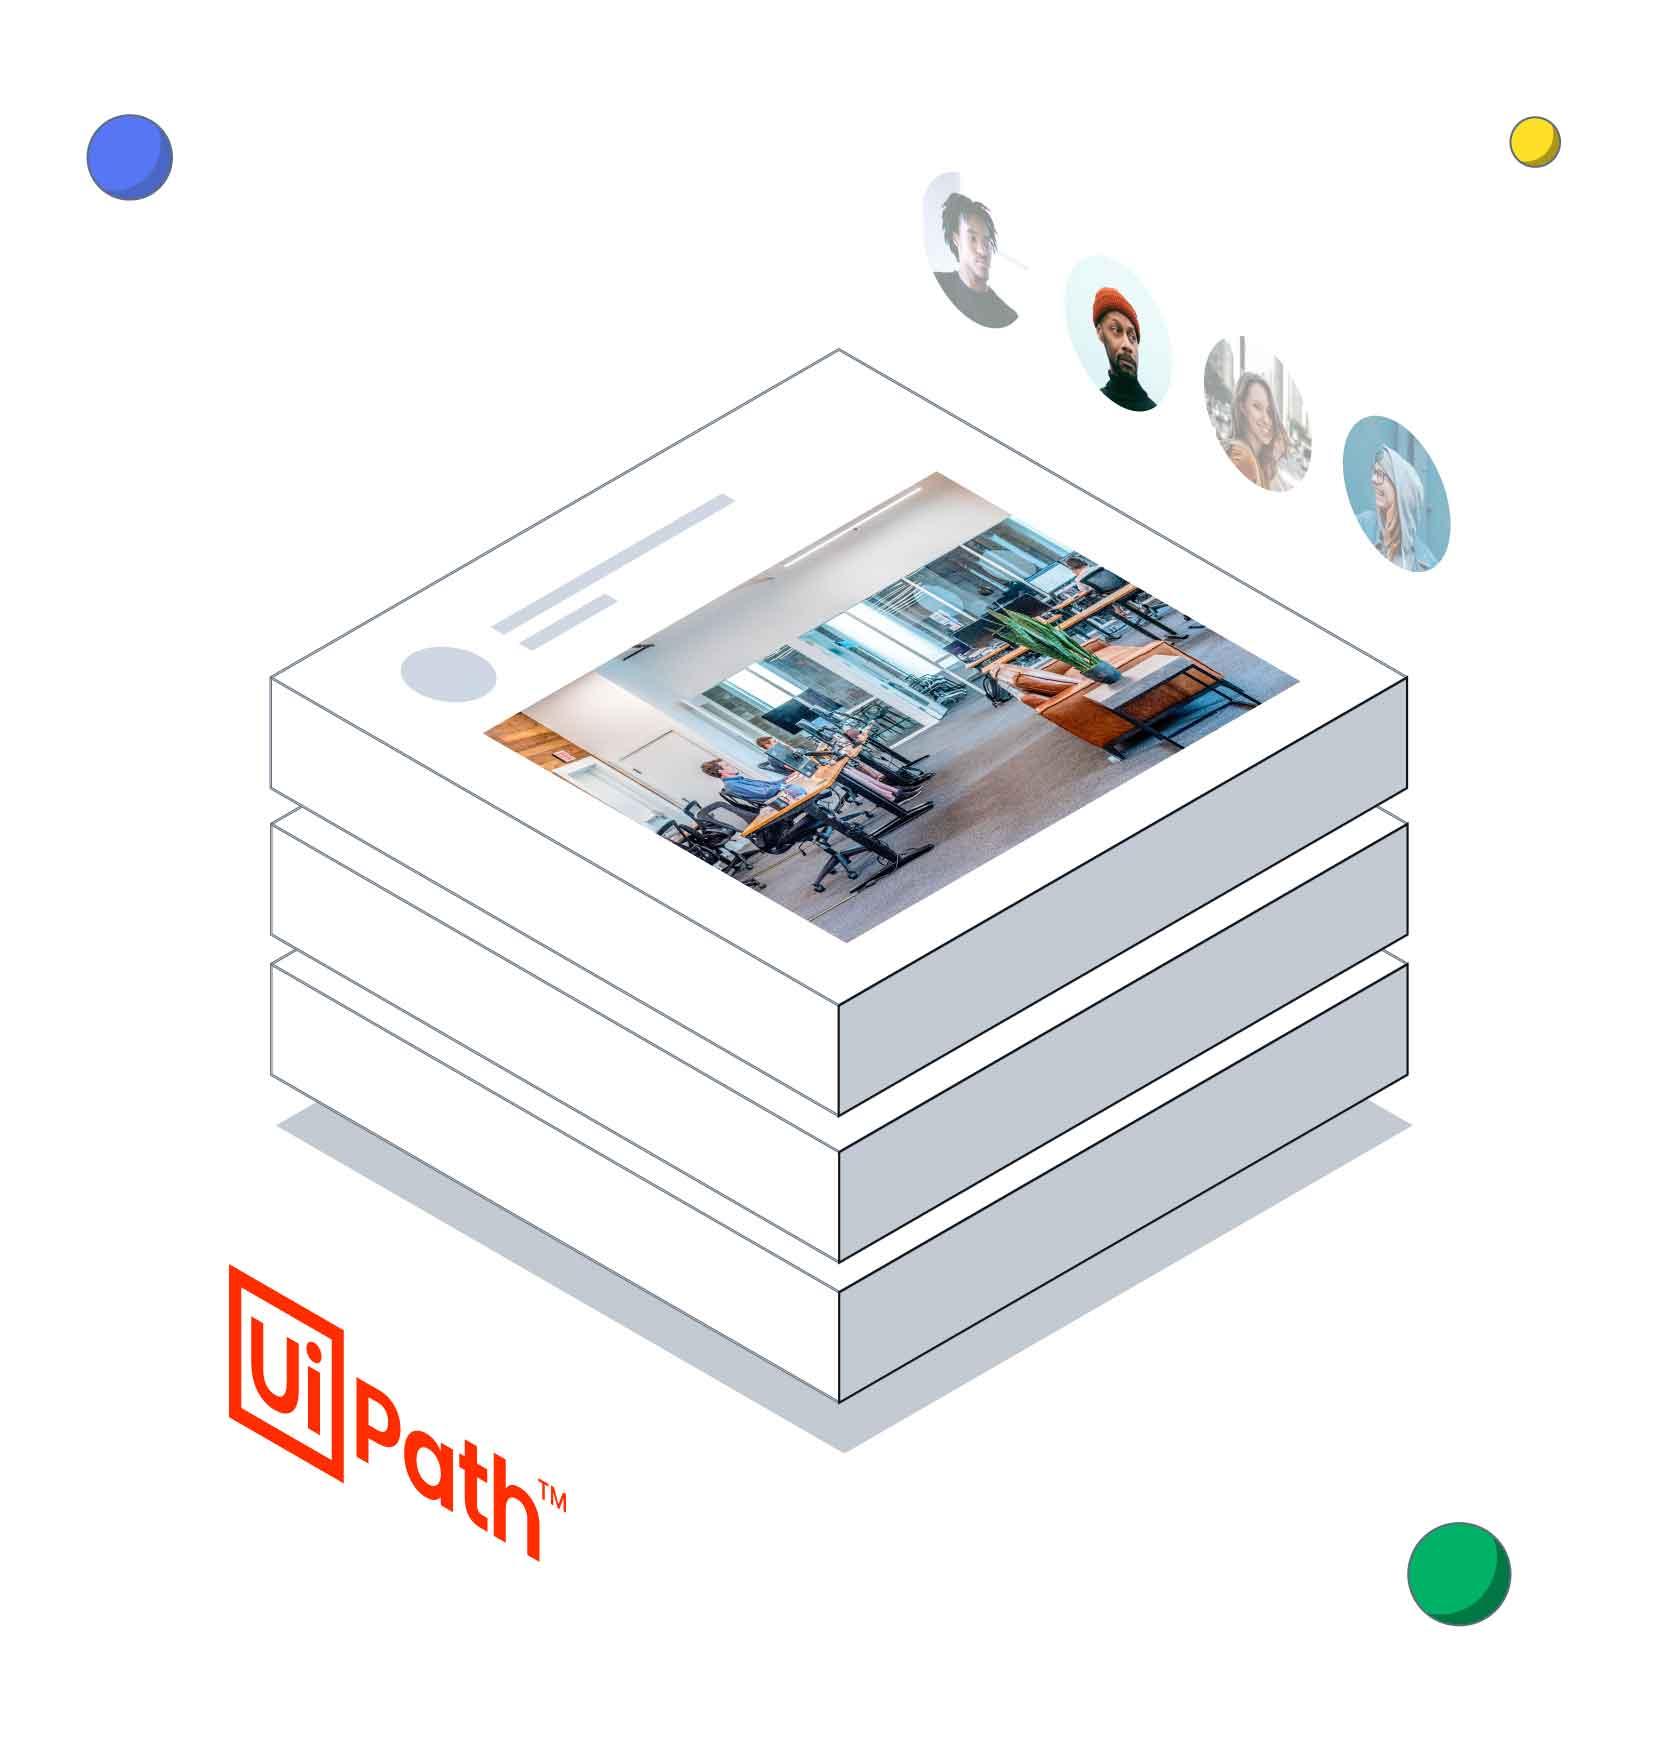 Uipath-Aug-09-2021-05-37-51-12-AM